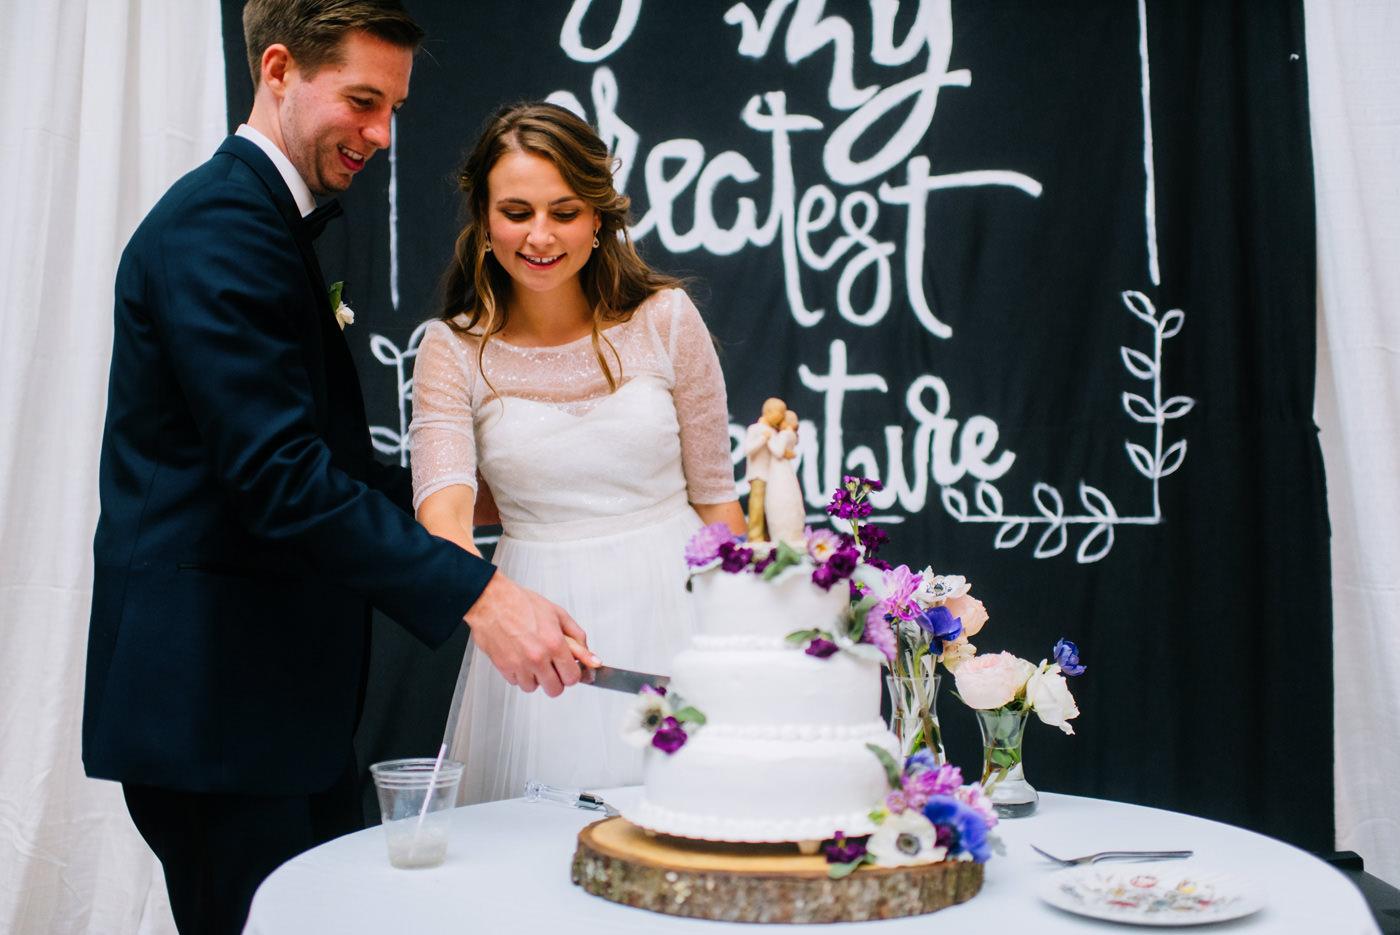 canaan valley wedding cake cutting